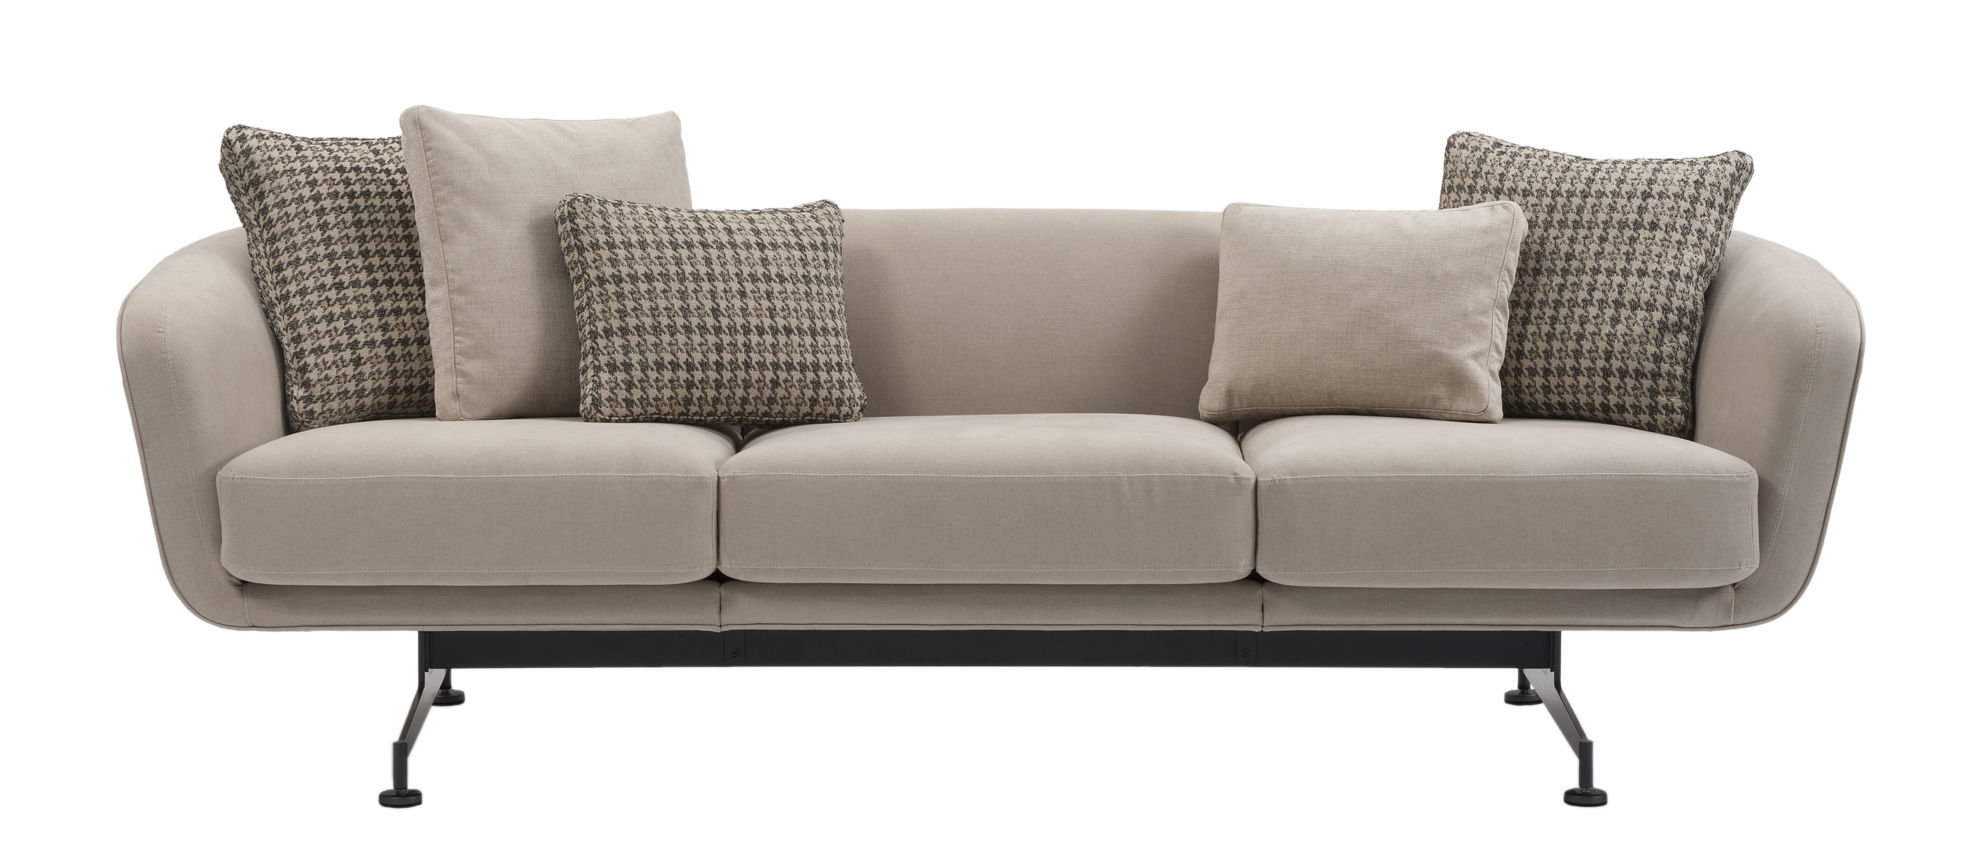 Furniture - Sofas - Betty Boop Straight sofa - / 3 seats - L 245 cm by Kartell - Beige / Black base - Fabric, Mousse de polyuréthane expansé, Painted steel